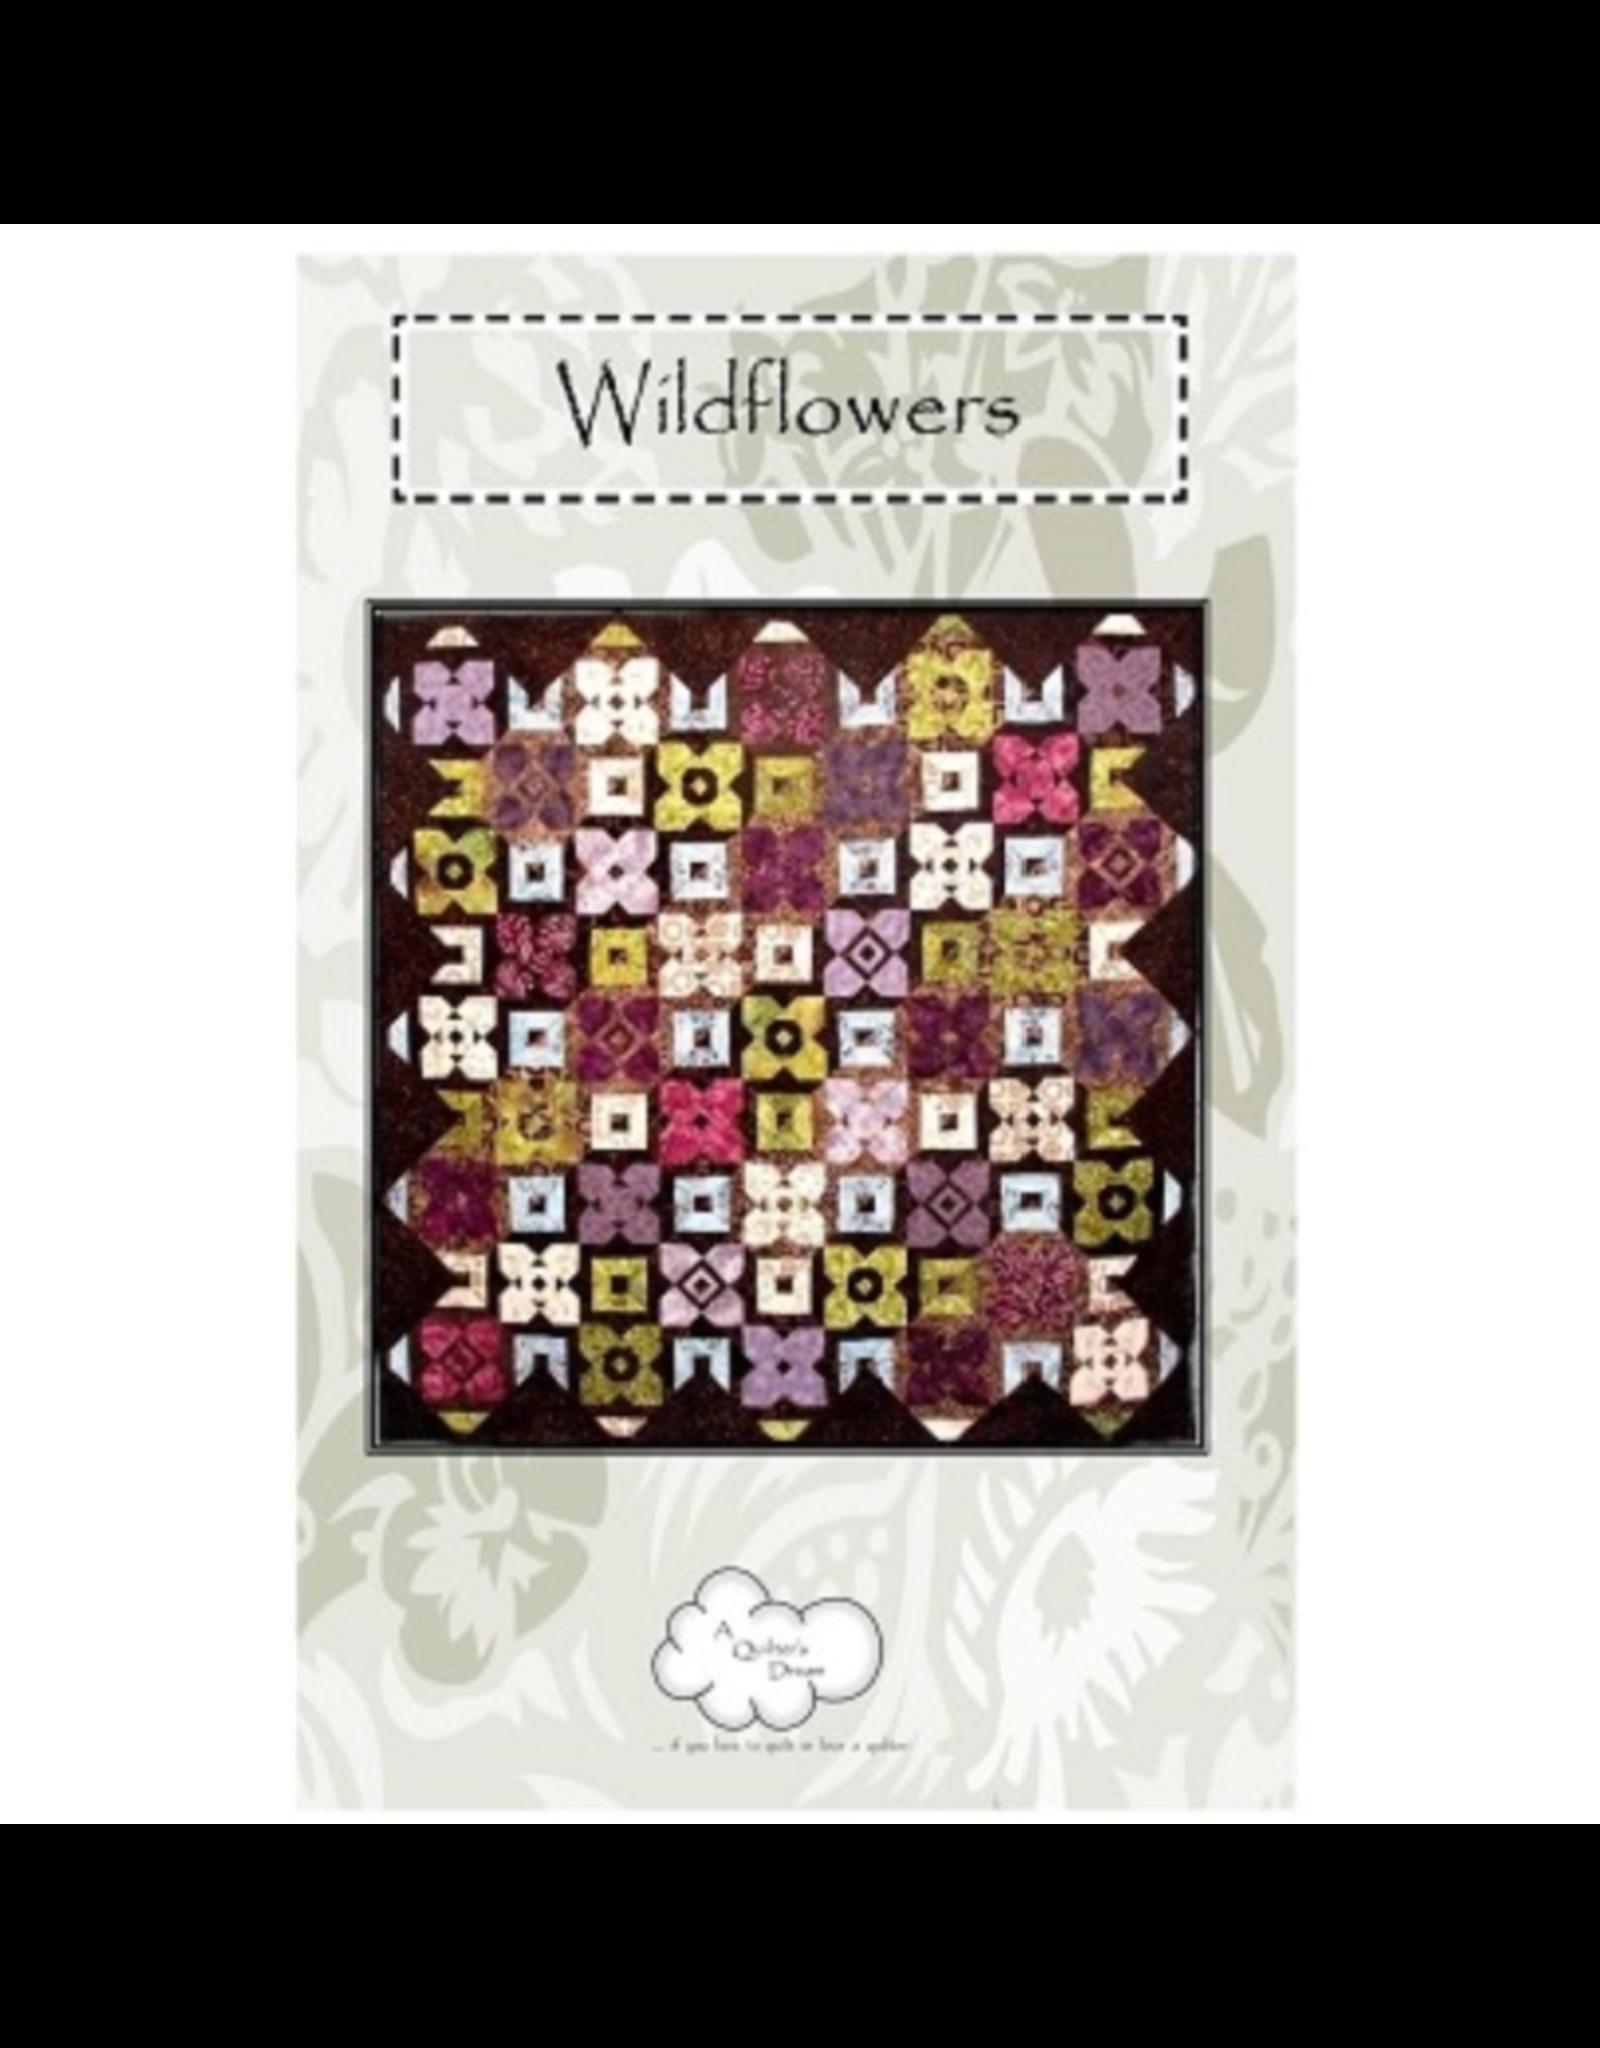 Picking Daisies Wildflowers Quilt Pattern